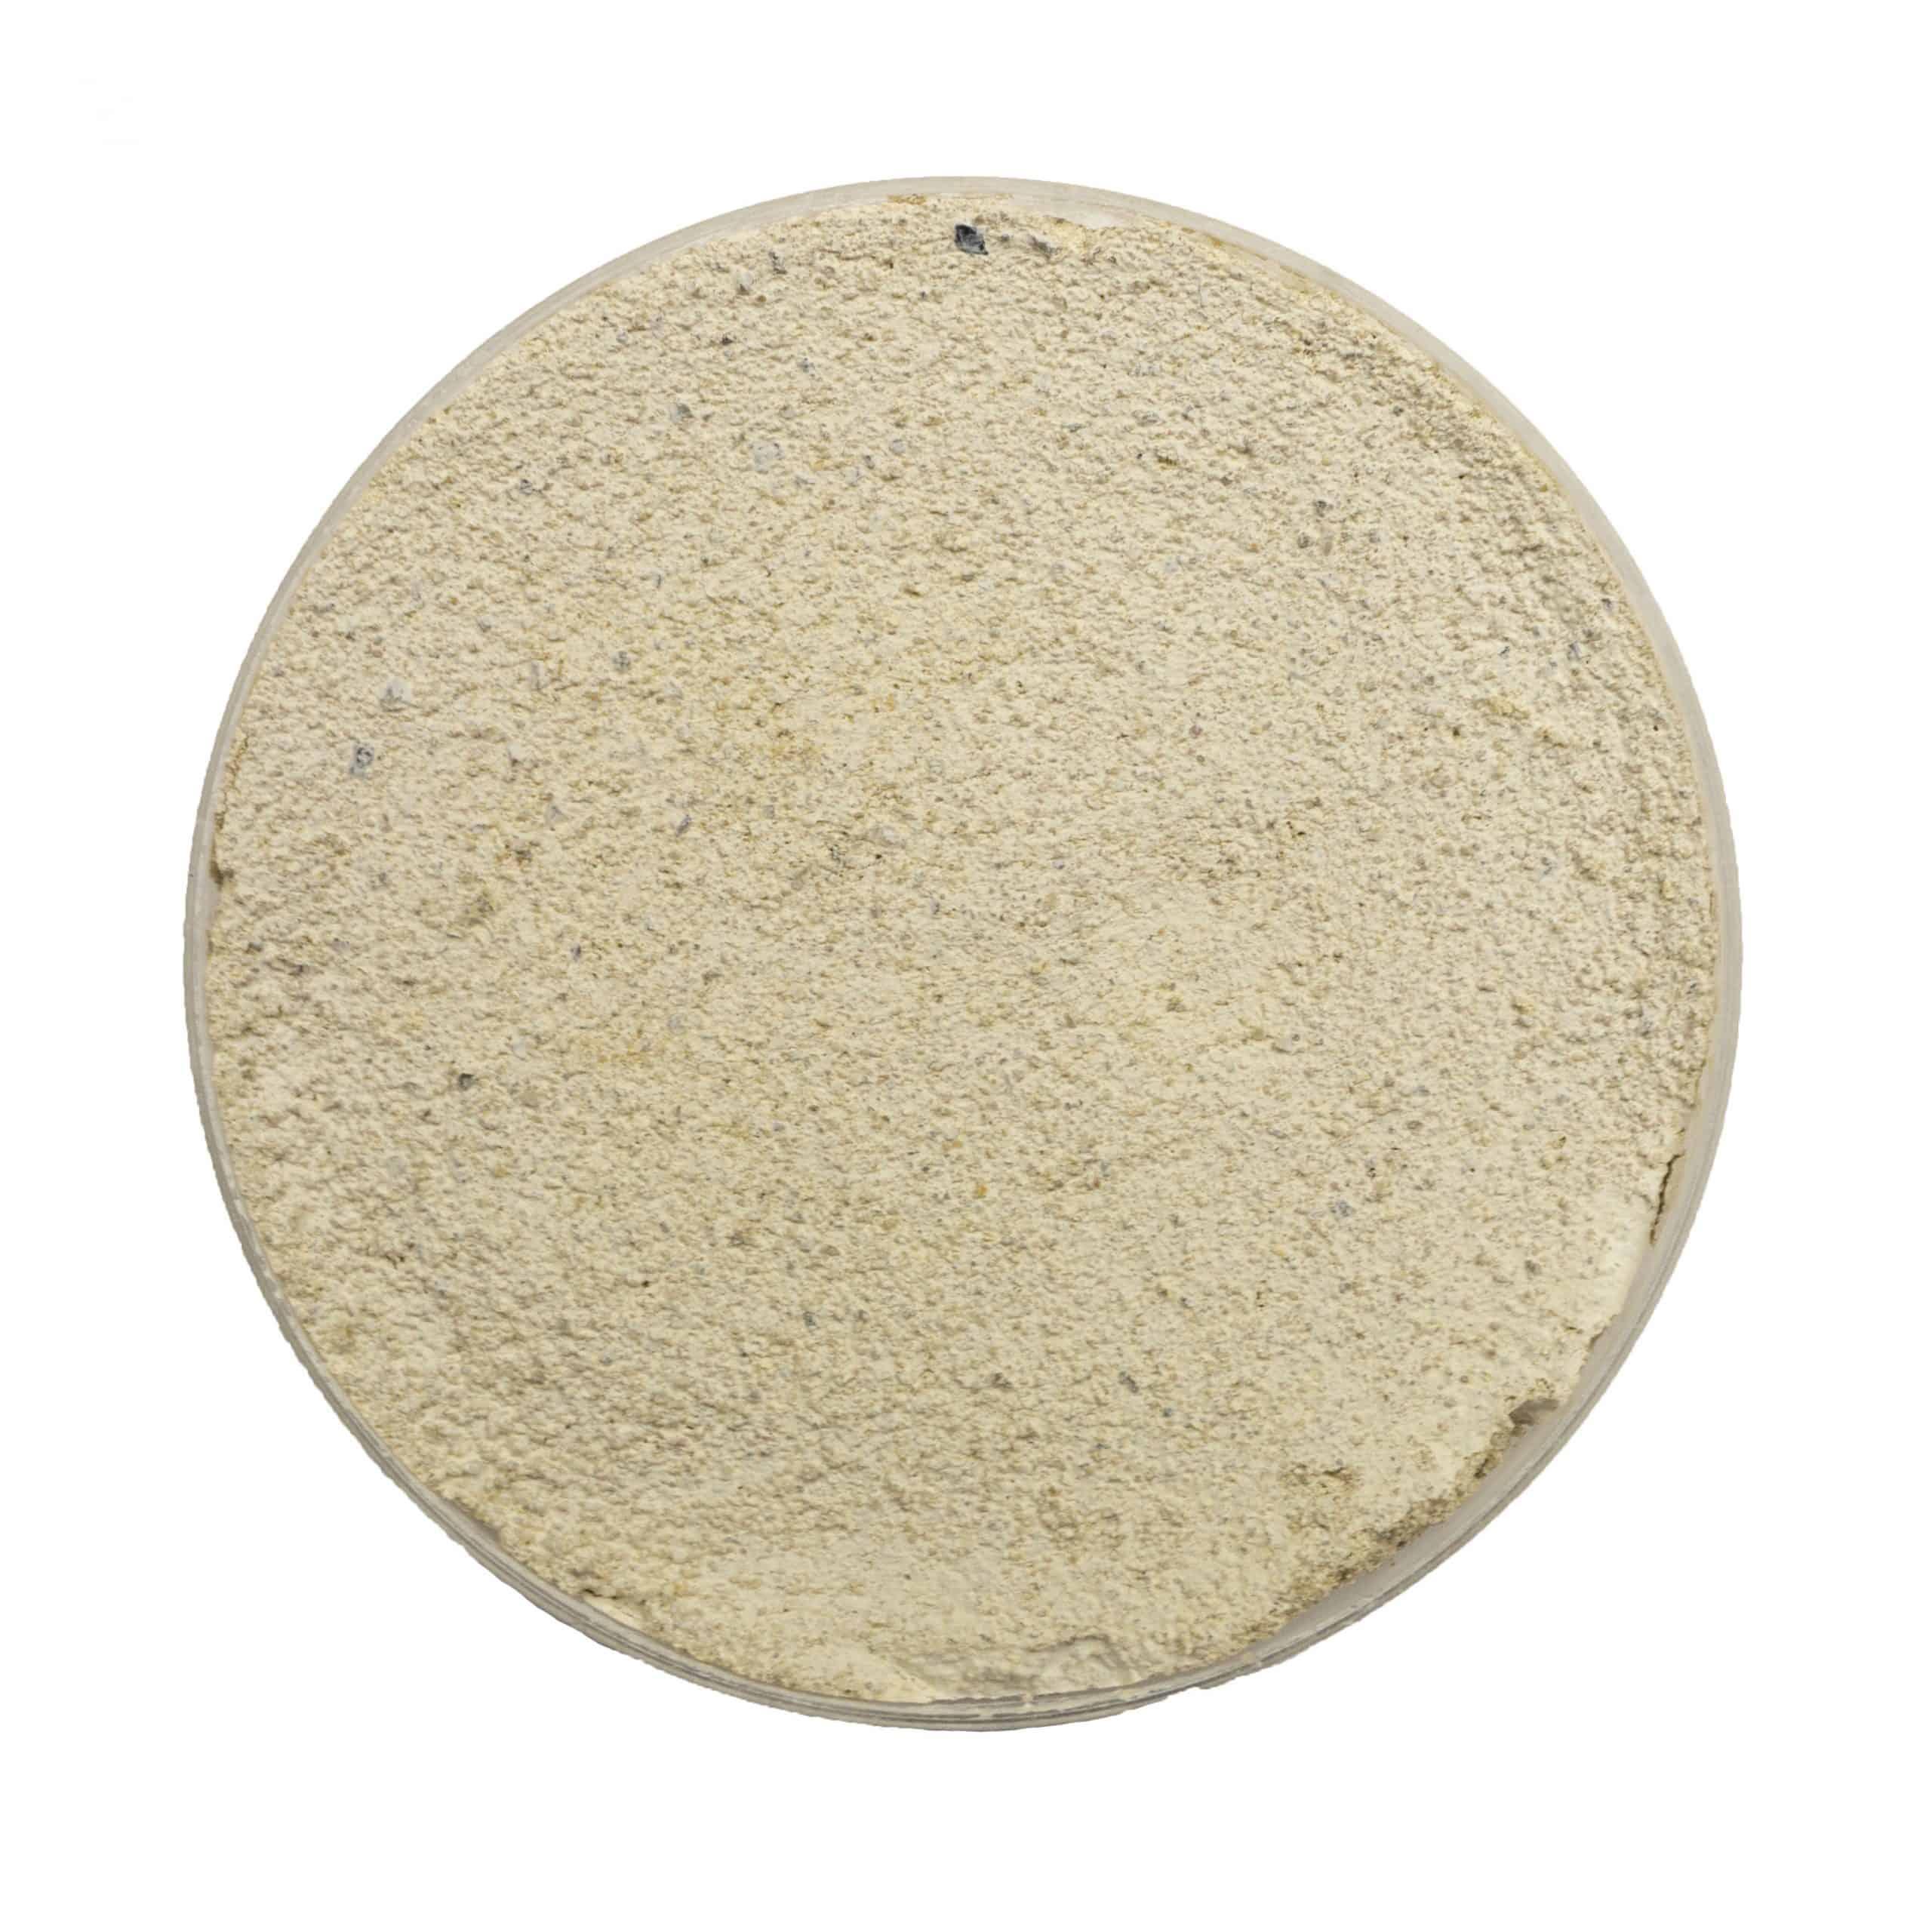 Basecoat Plaster (Without Fibres)